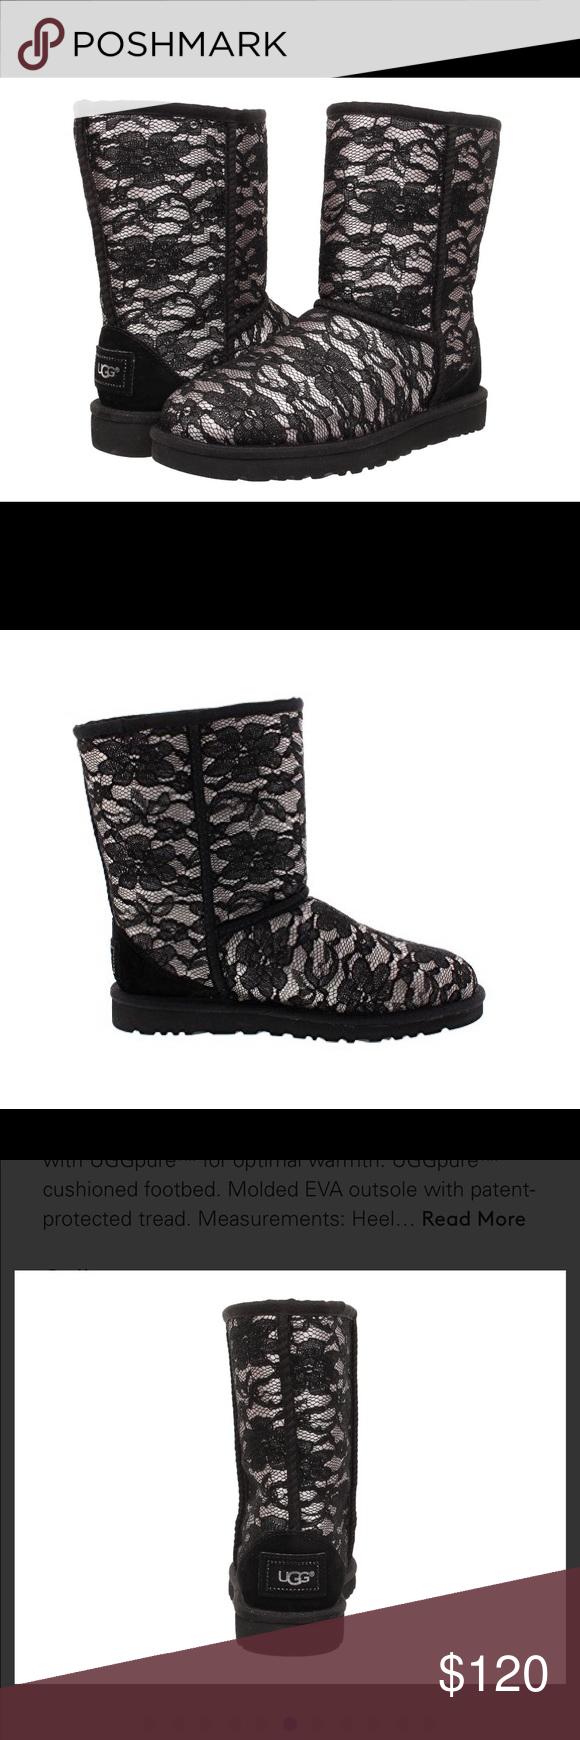 ba11191aa40 Black Classic Short Antoinette Ugg Boot Size 6 Beautiful NWOT lace ...